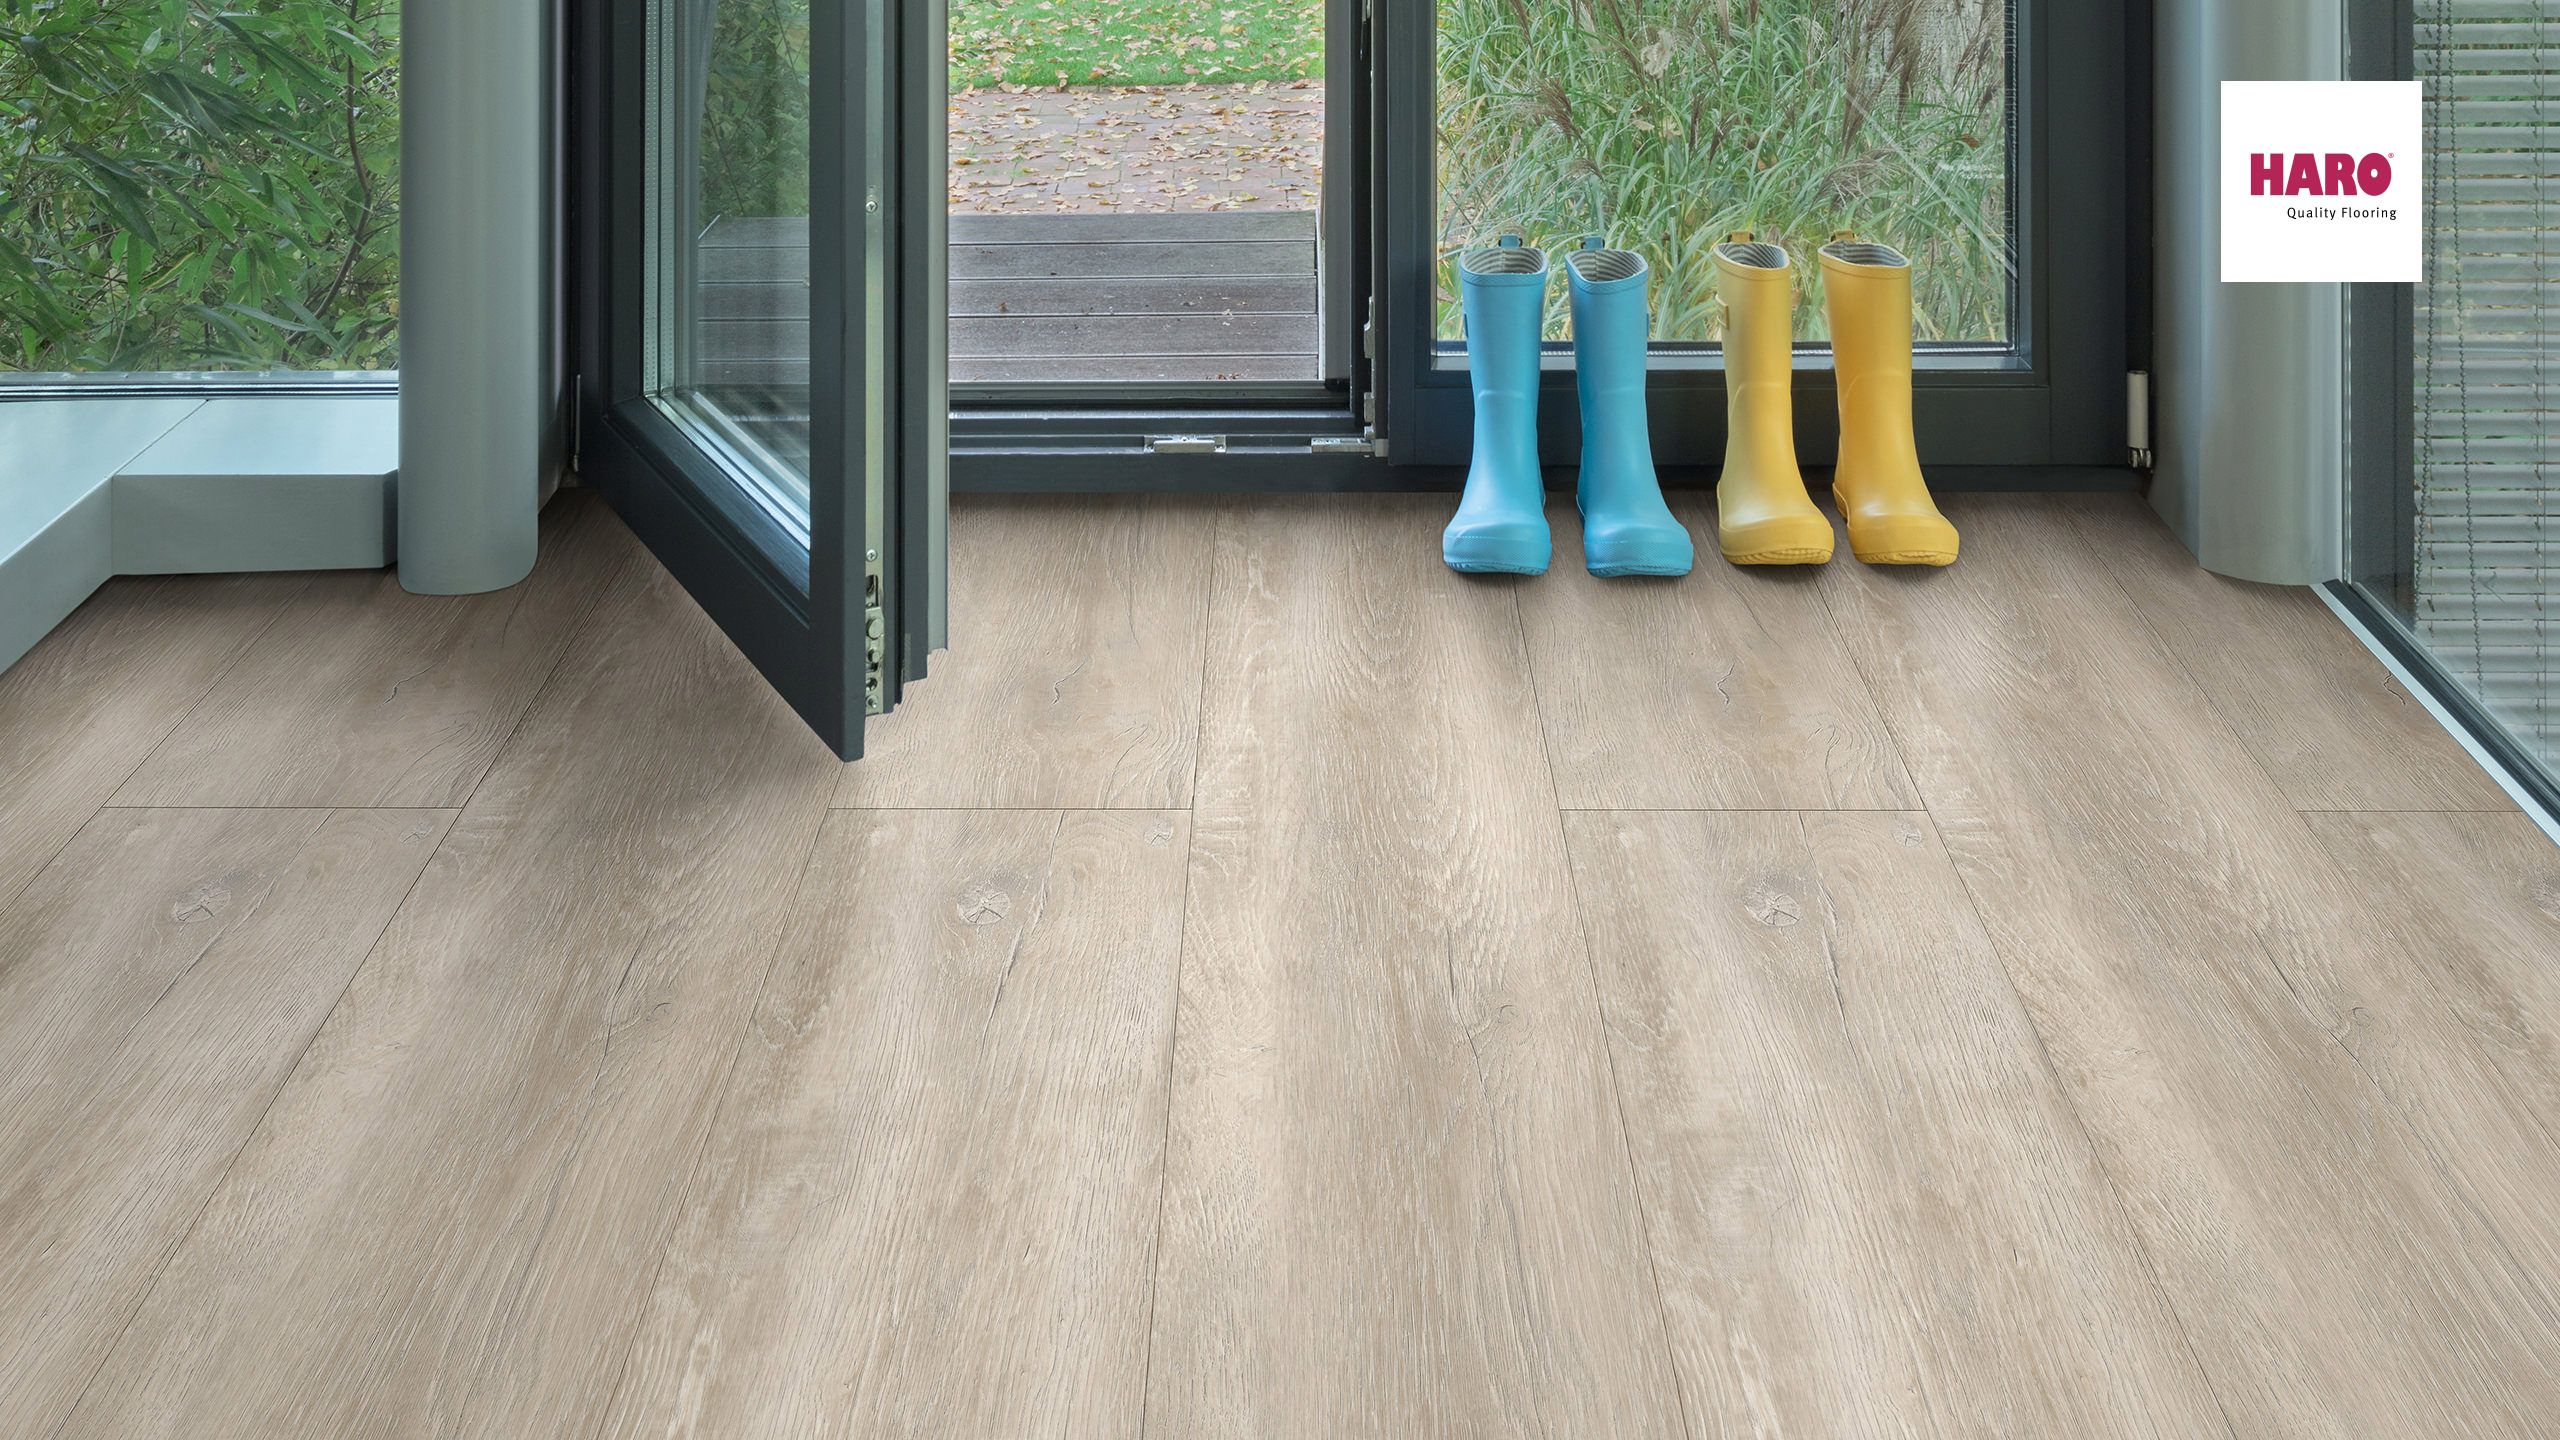 Vinyl Fußboden Für Terrasse ~ Vinylboden design boden v fachhändler holz ziller